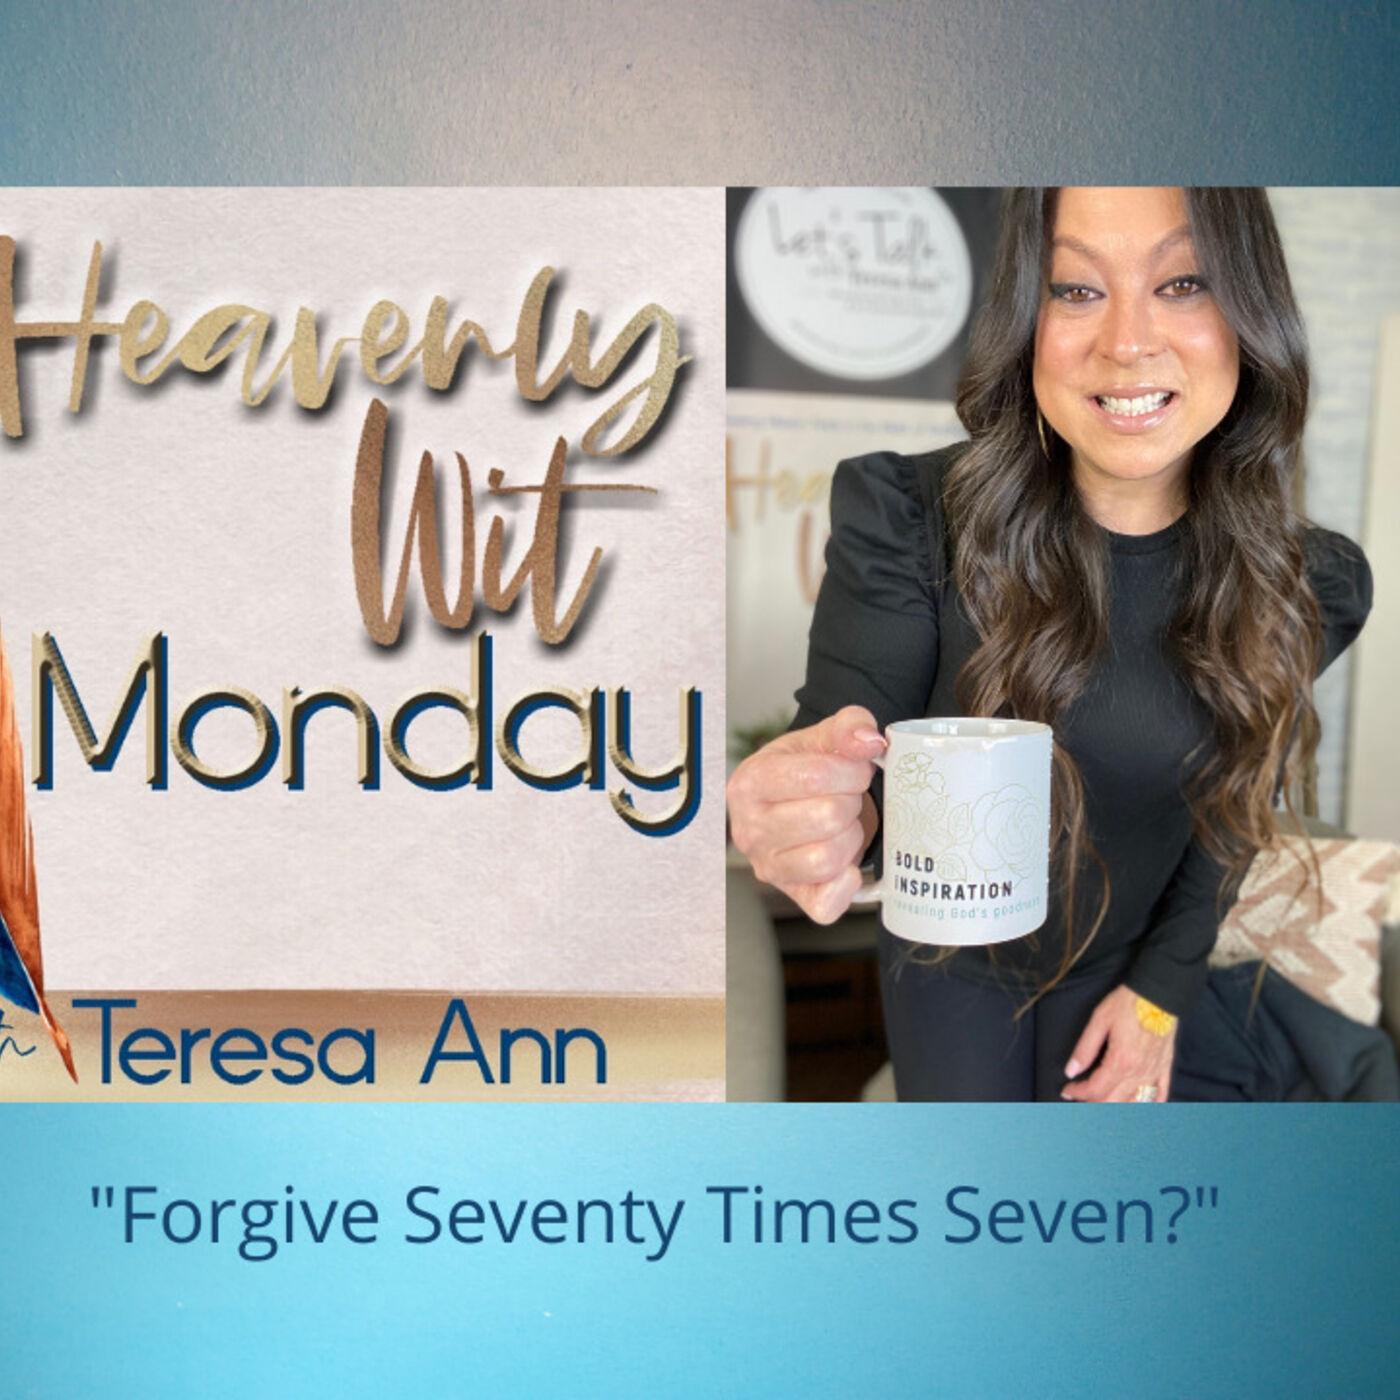 HEAVENLY WIT MONDAY   FORGIVE SEVENTY TIMES SEVEN?